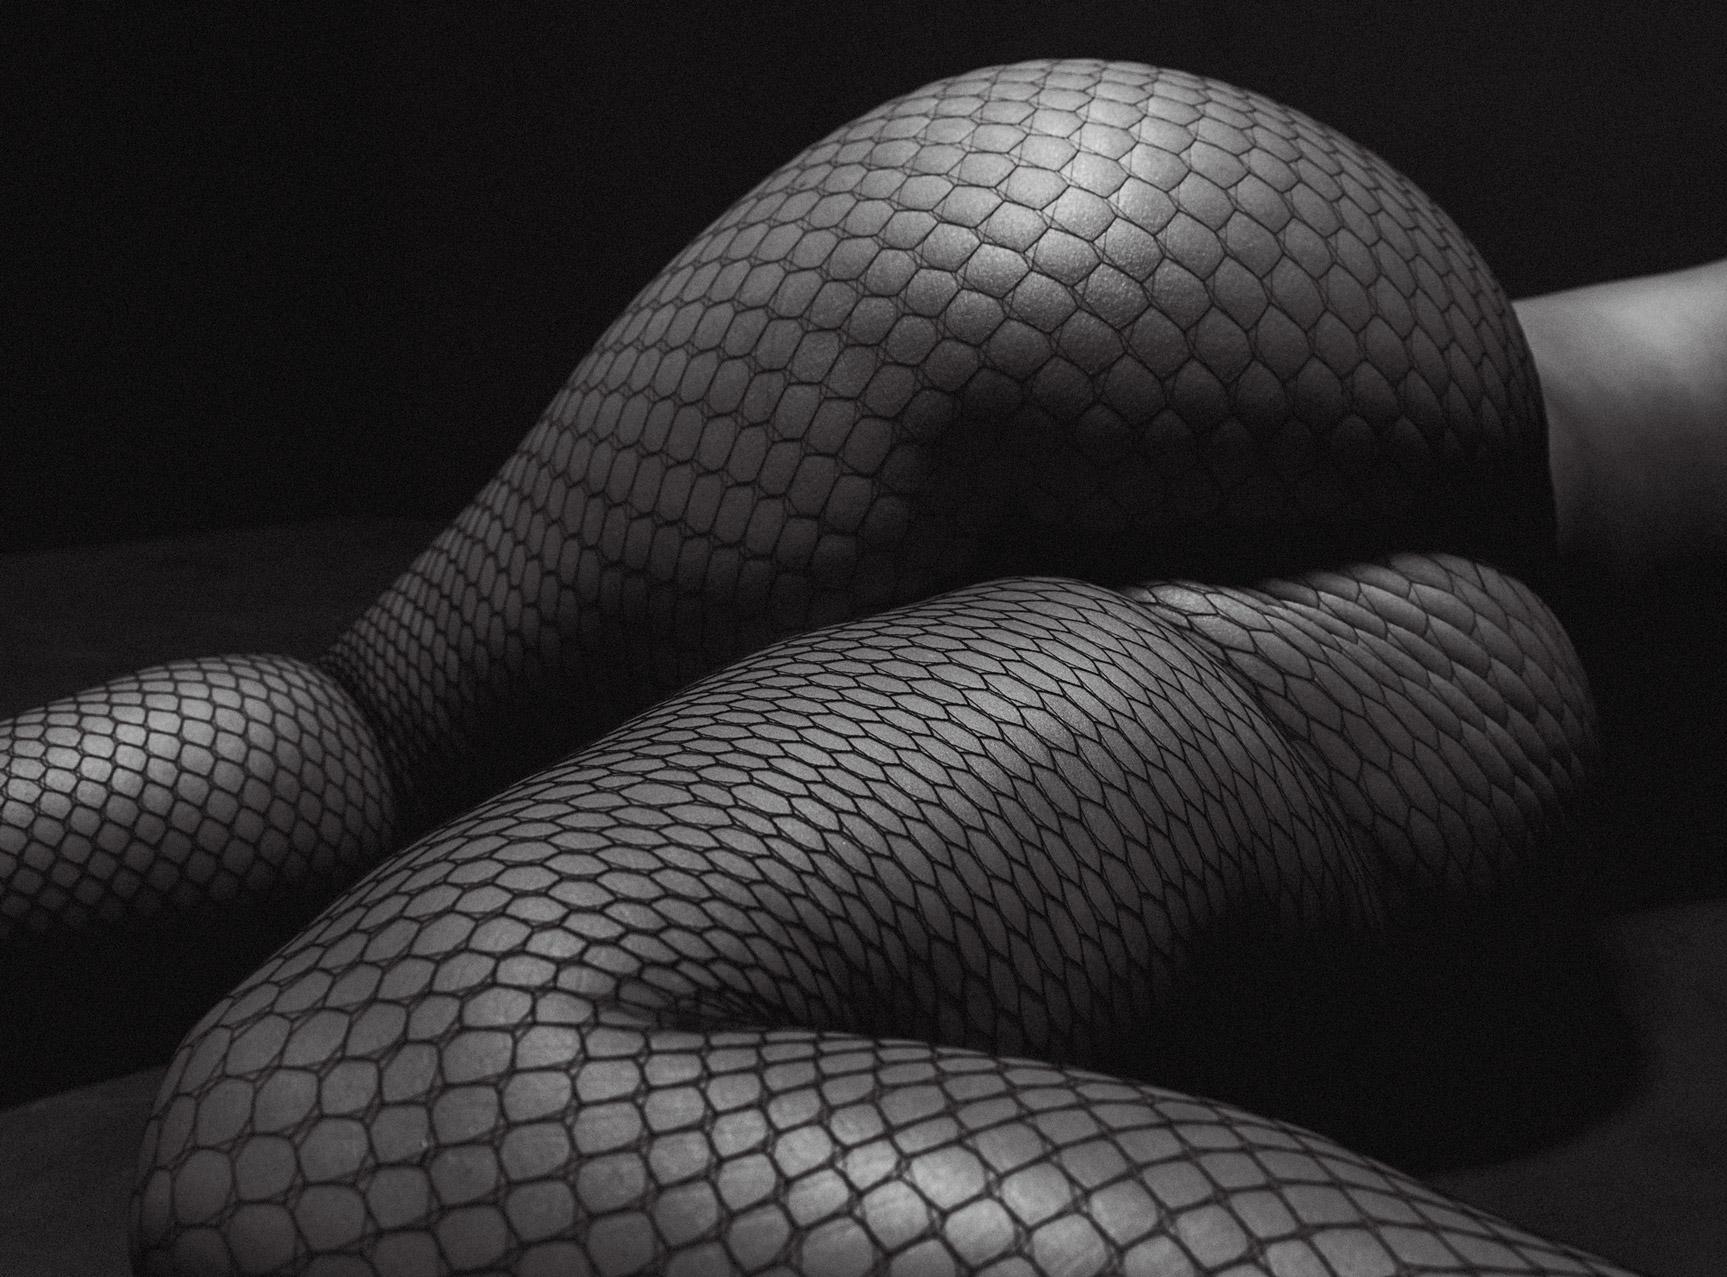 Эшли Грэм / Ashley Graham nude by Mario Sorrenti - V Magazine summer 2017